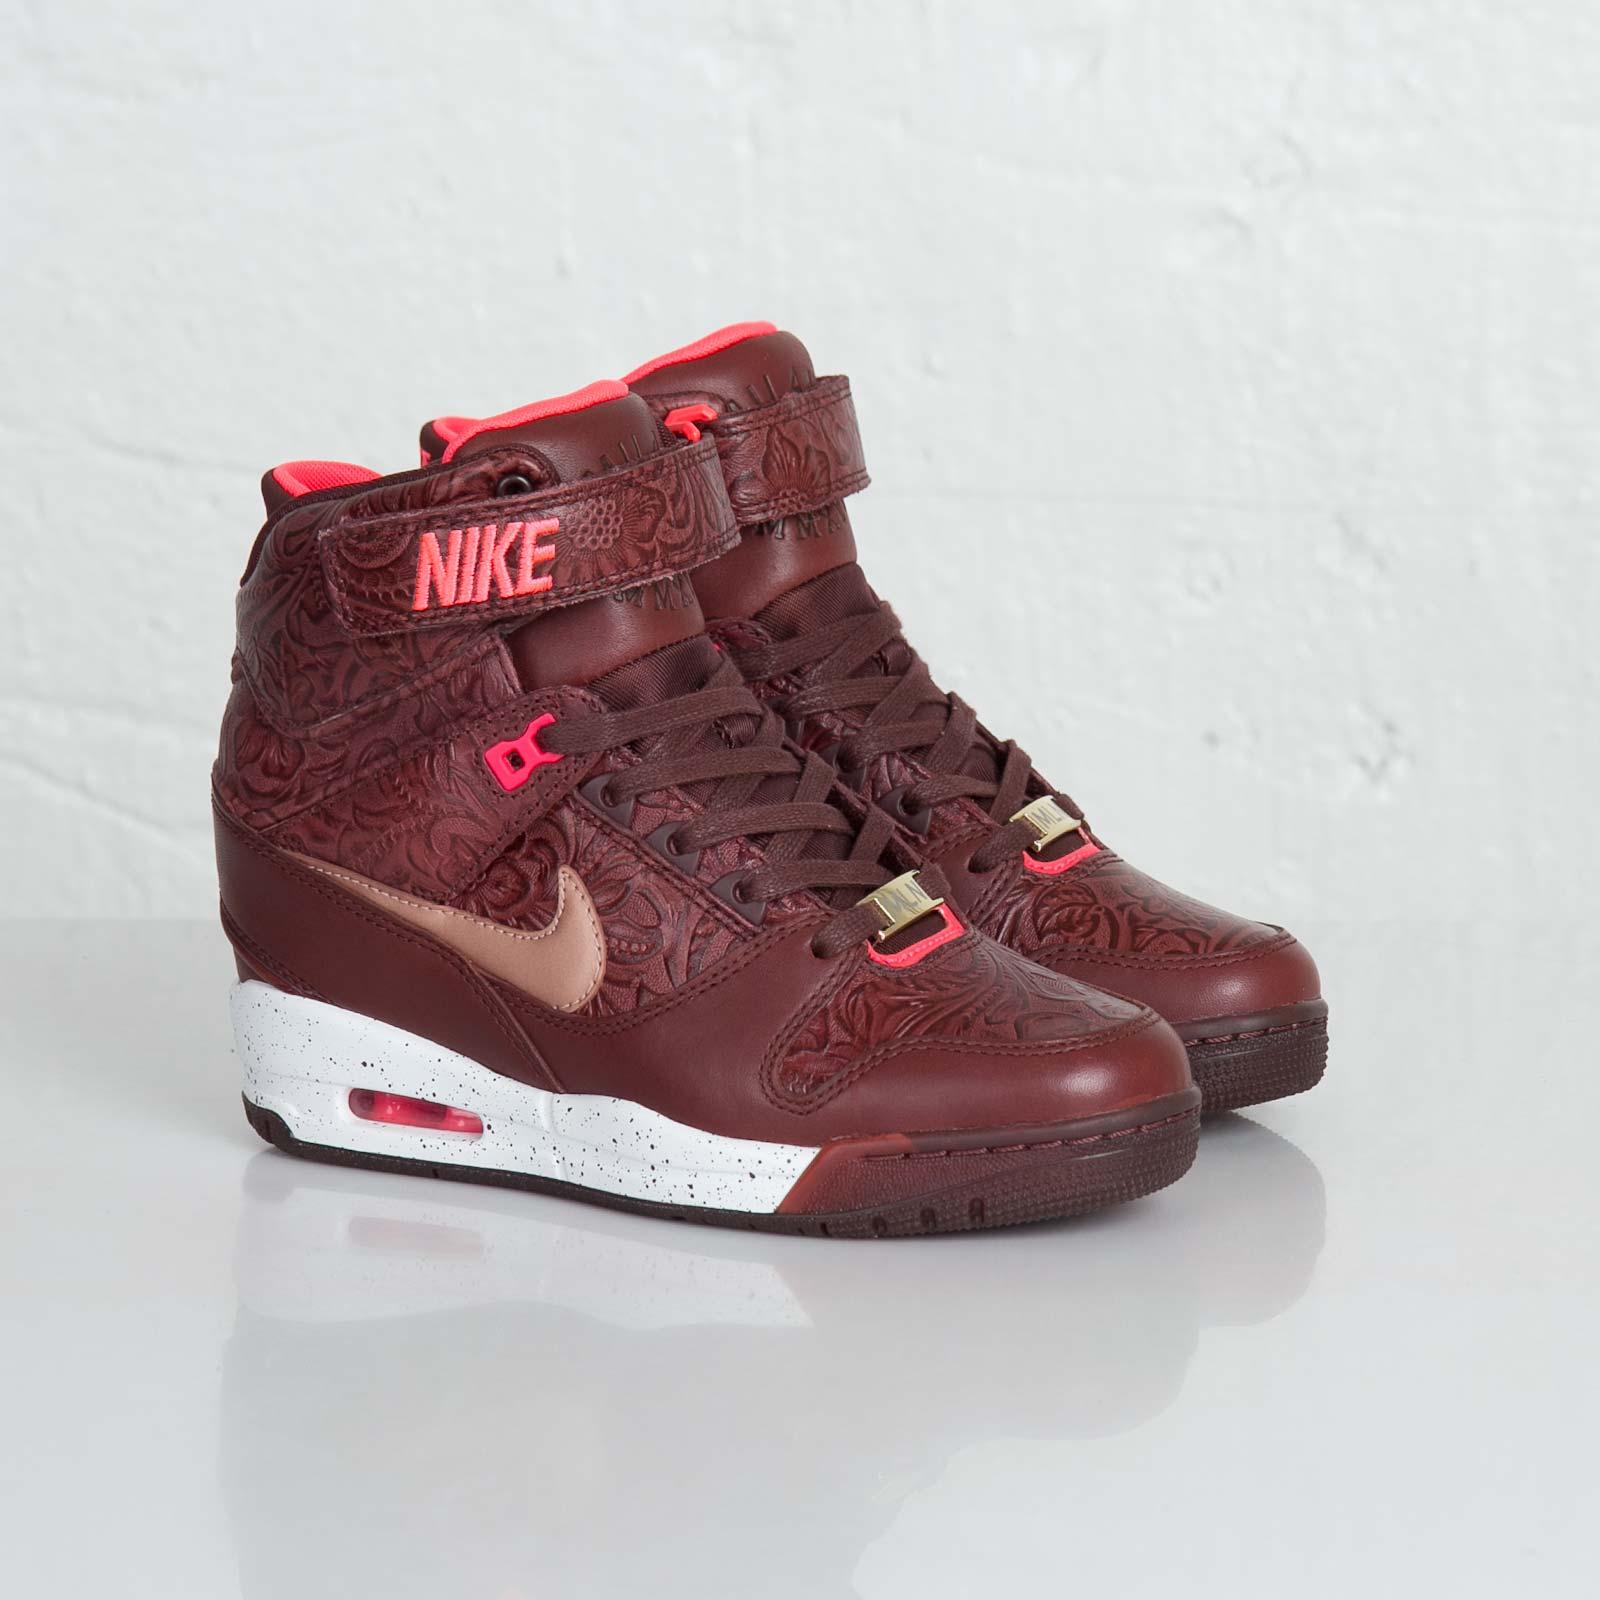 new product ccbe1 c0cba Nike W Air Revolution Sky Hi FW QS - 633525-200 - Sneakersnstuff ...